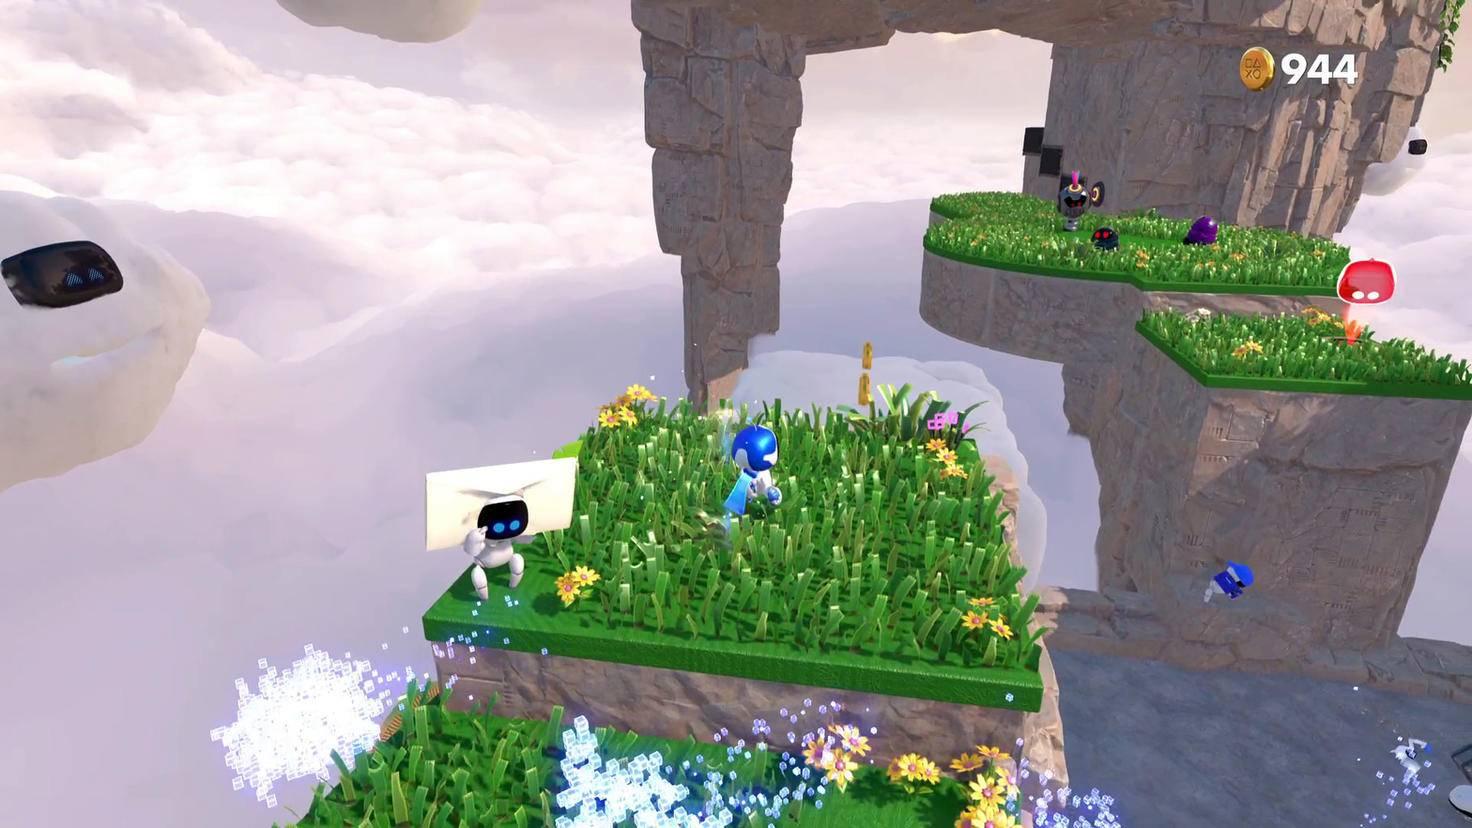 ps5-astros-playroom-gameplay